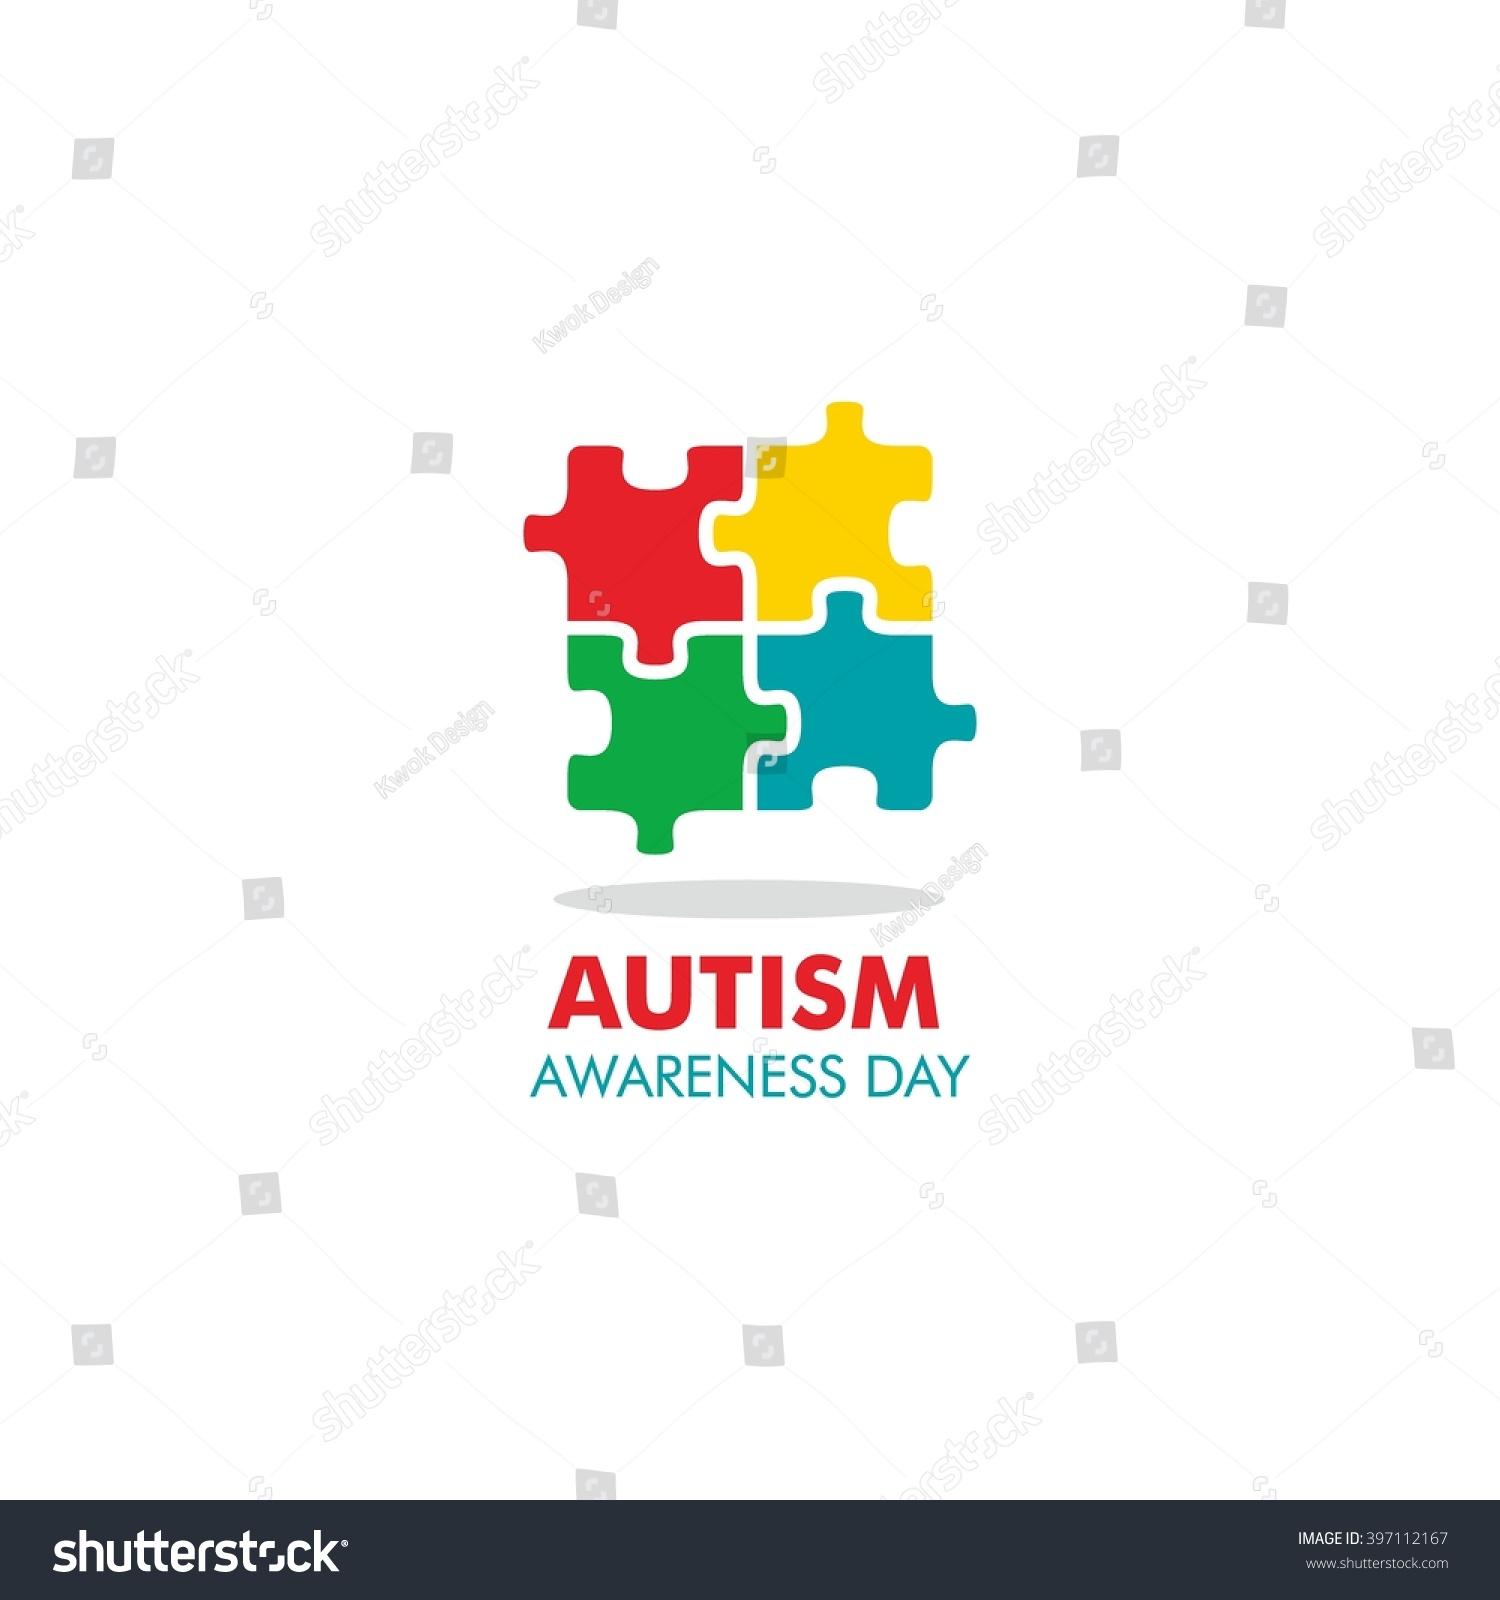 World autism awareness day logo design stock vector 397112167 world autism awareness day logo design template vector illustration colorful puzzles symbol biocorpaavc